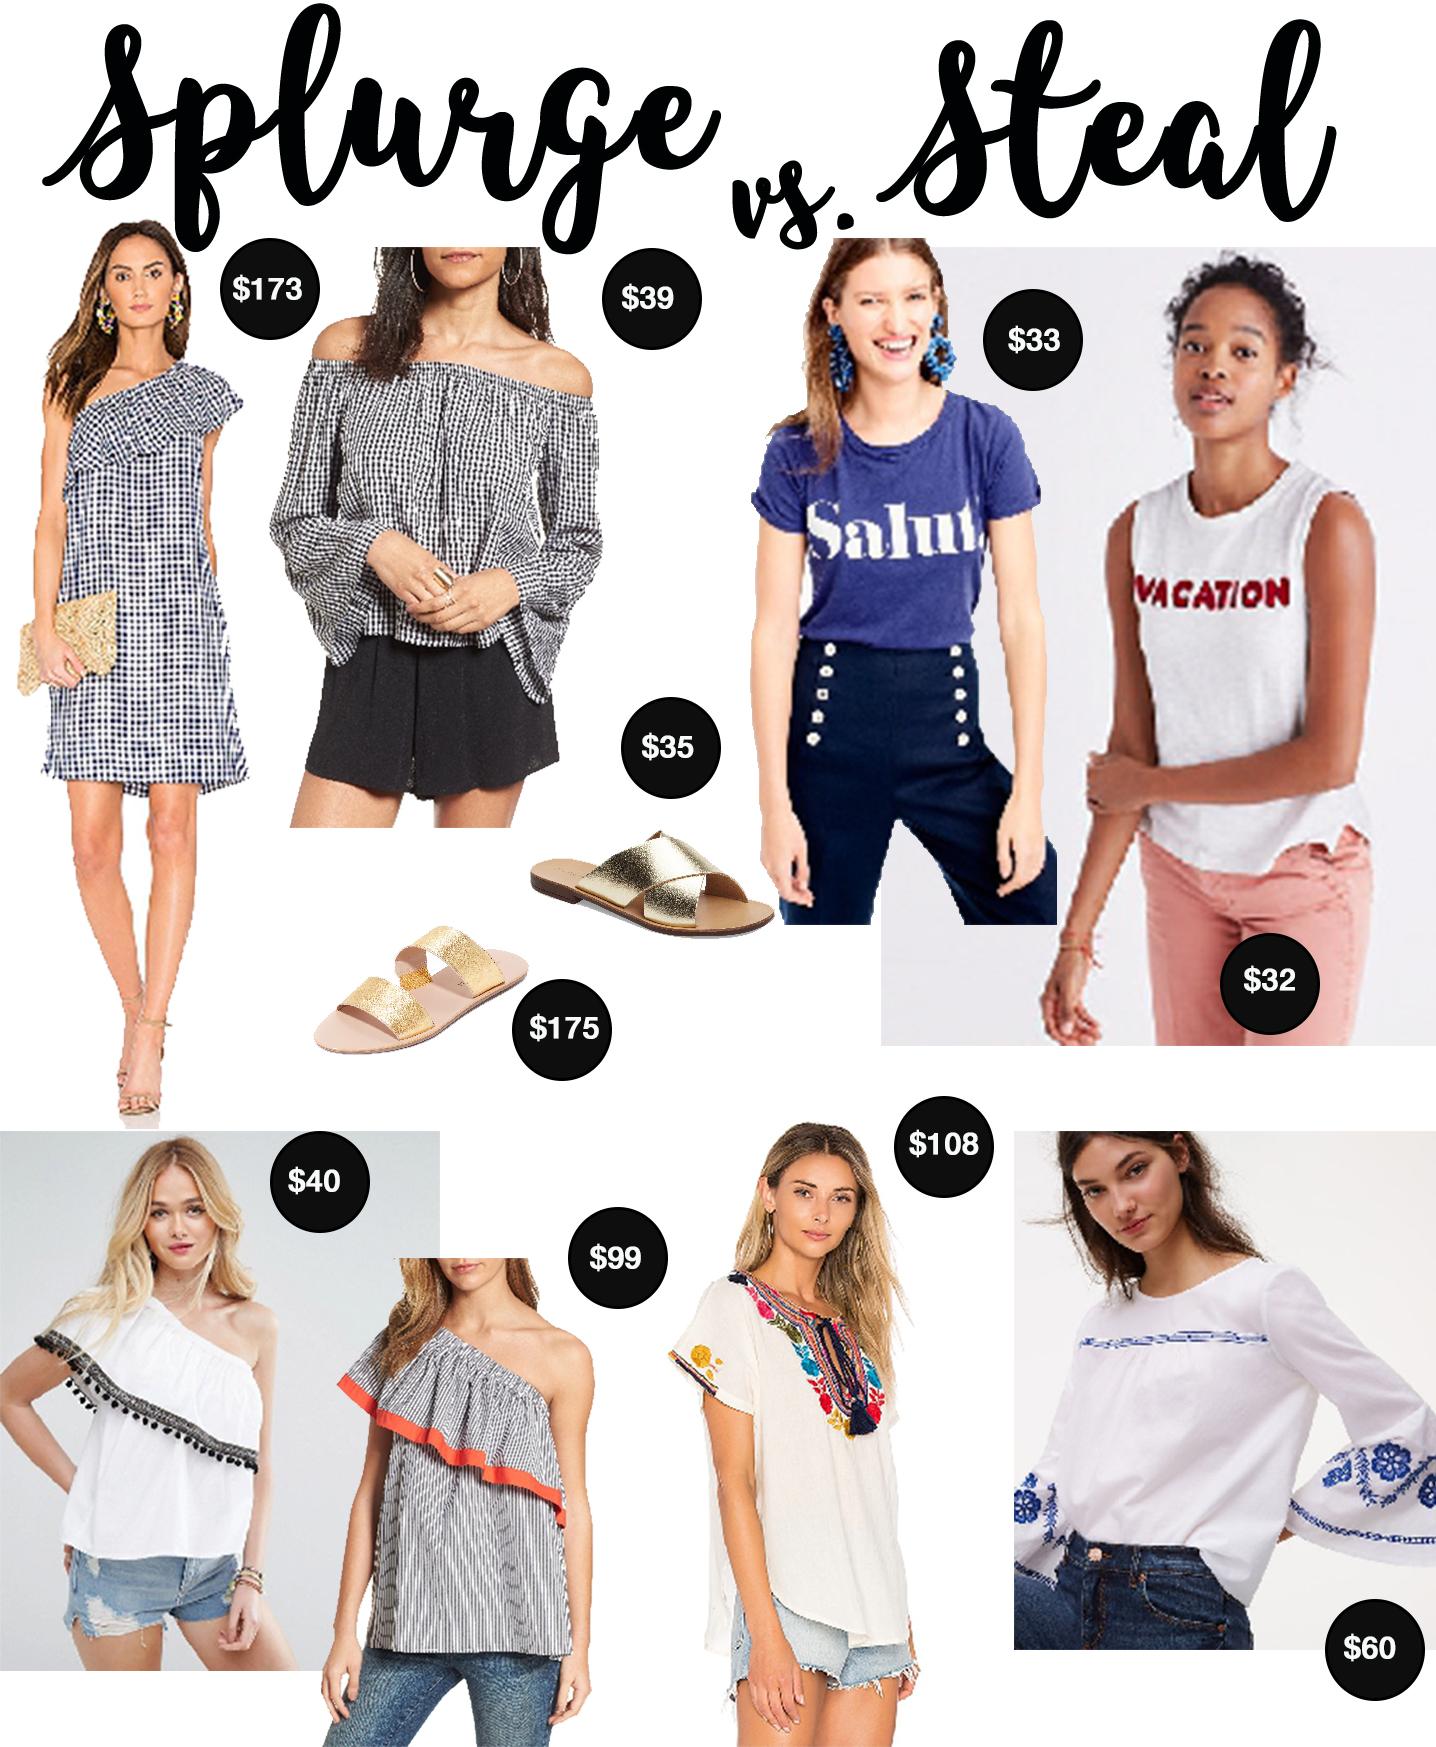 Splurge vs. Steal Summer Style